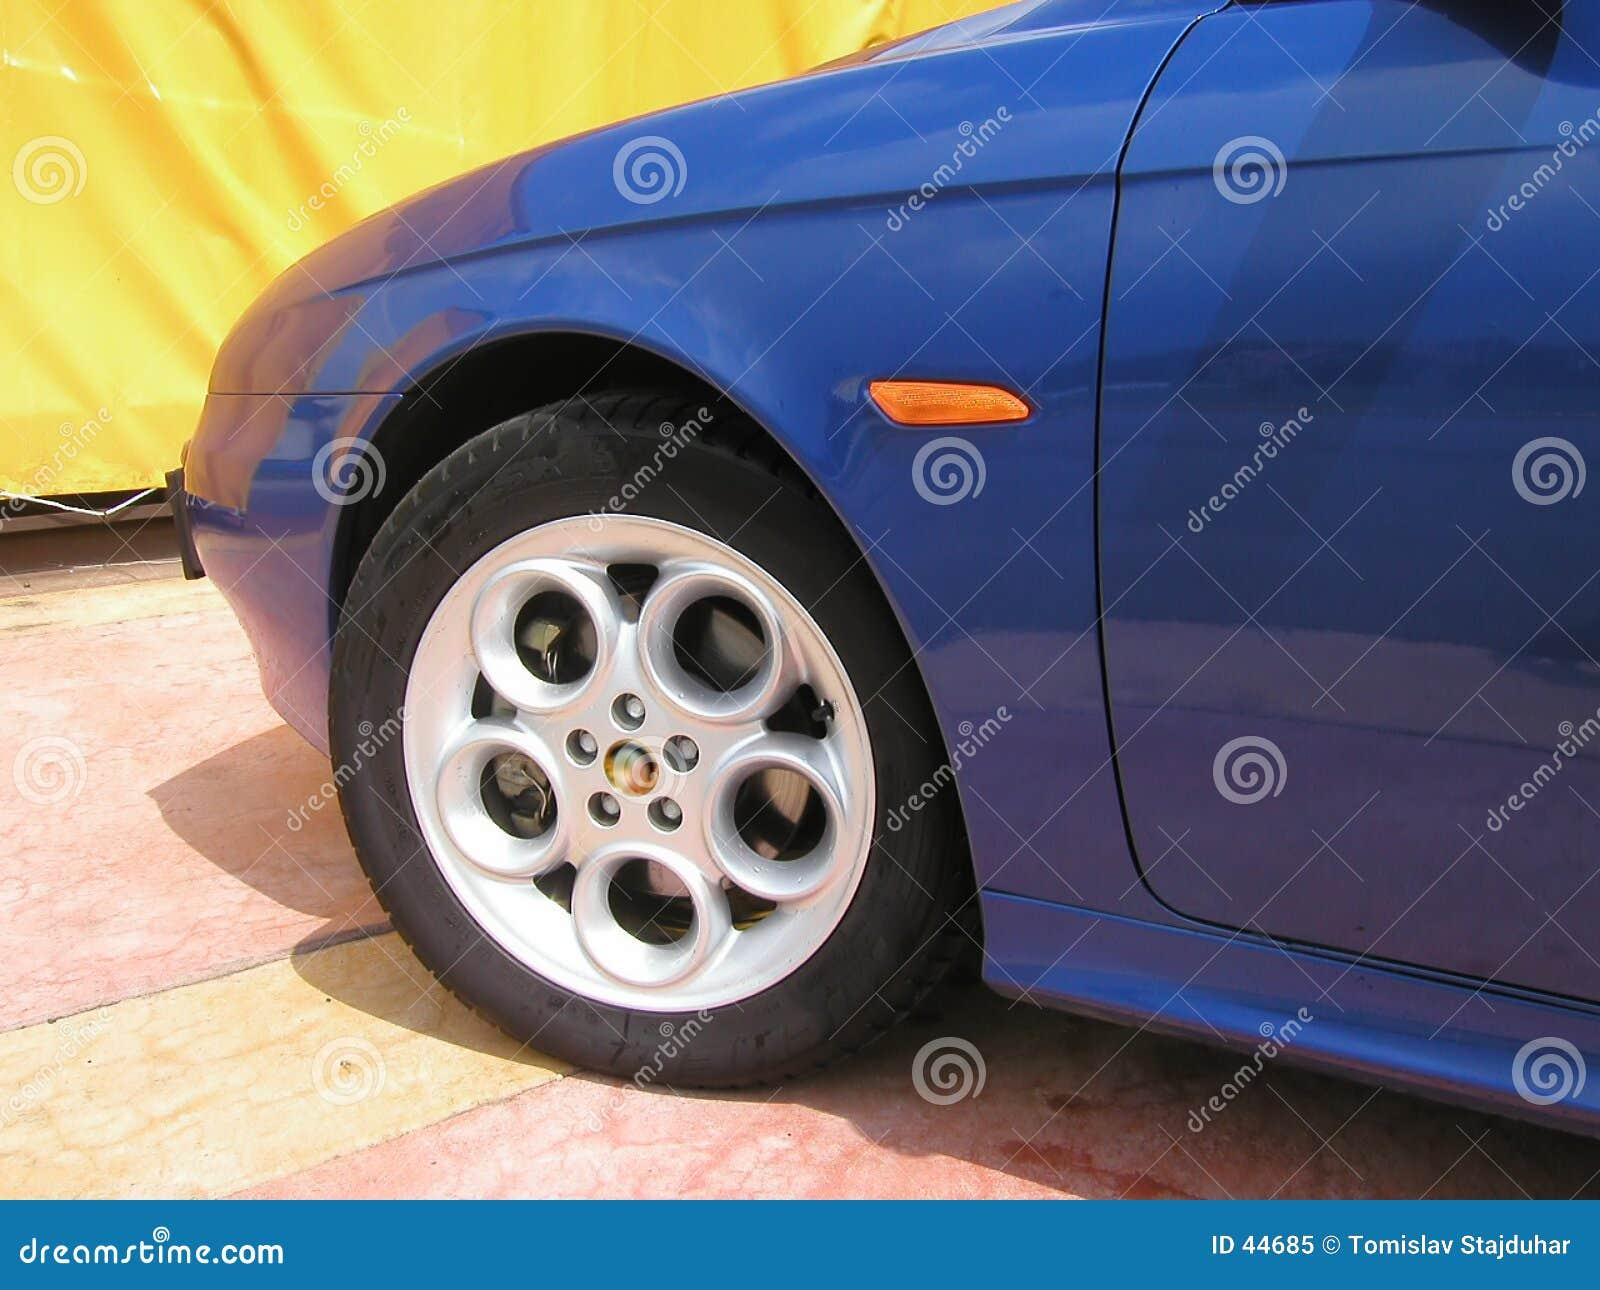 Download Rueda de Alfa Romeo 156 imagen de archivo. Imagen de coche - 44685